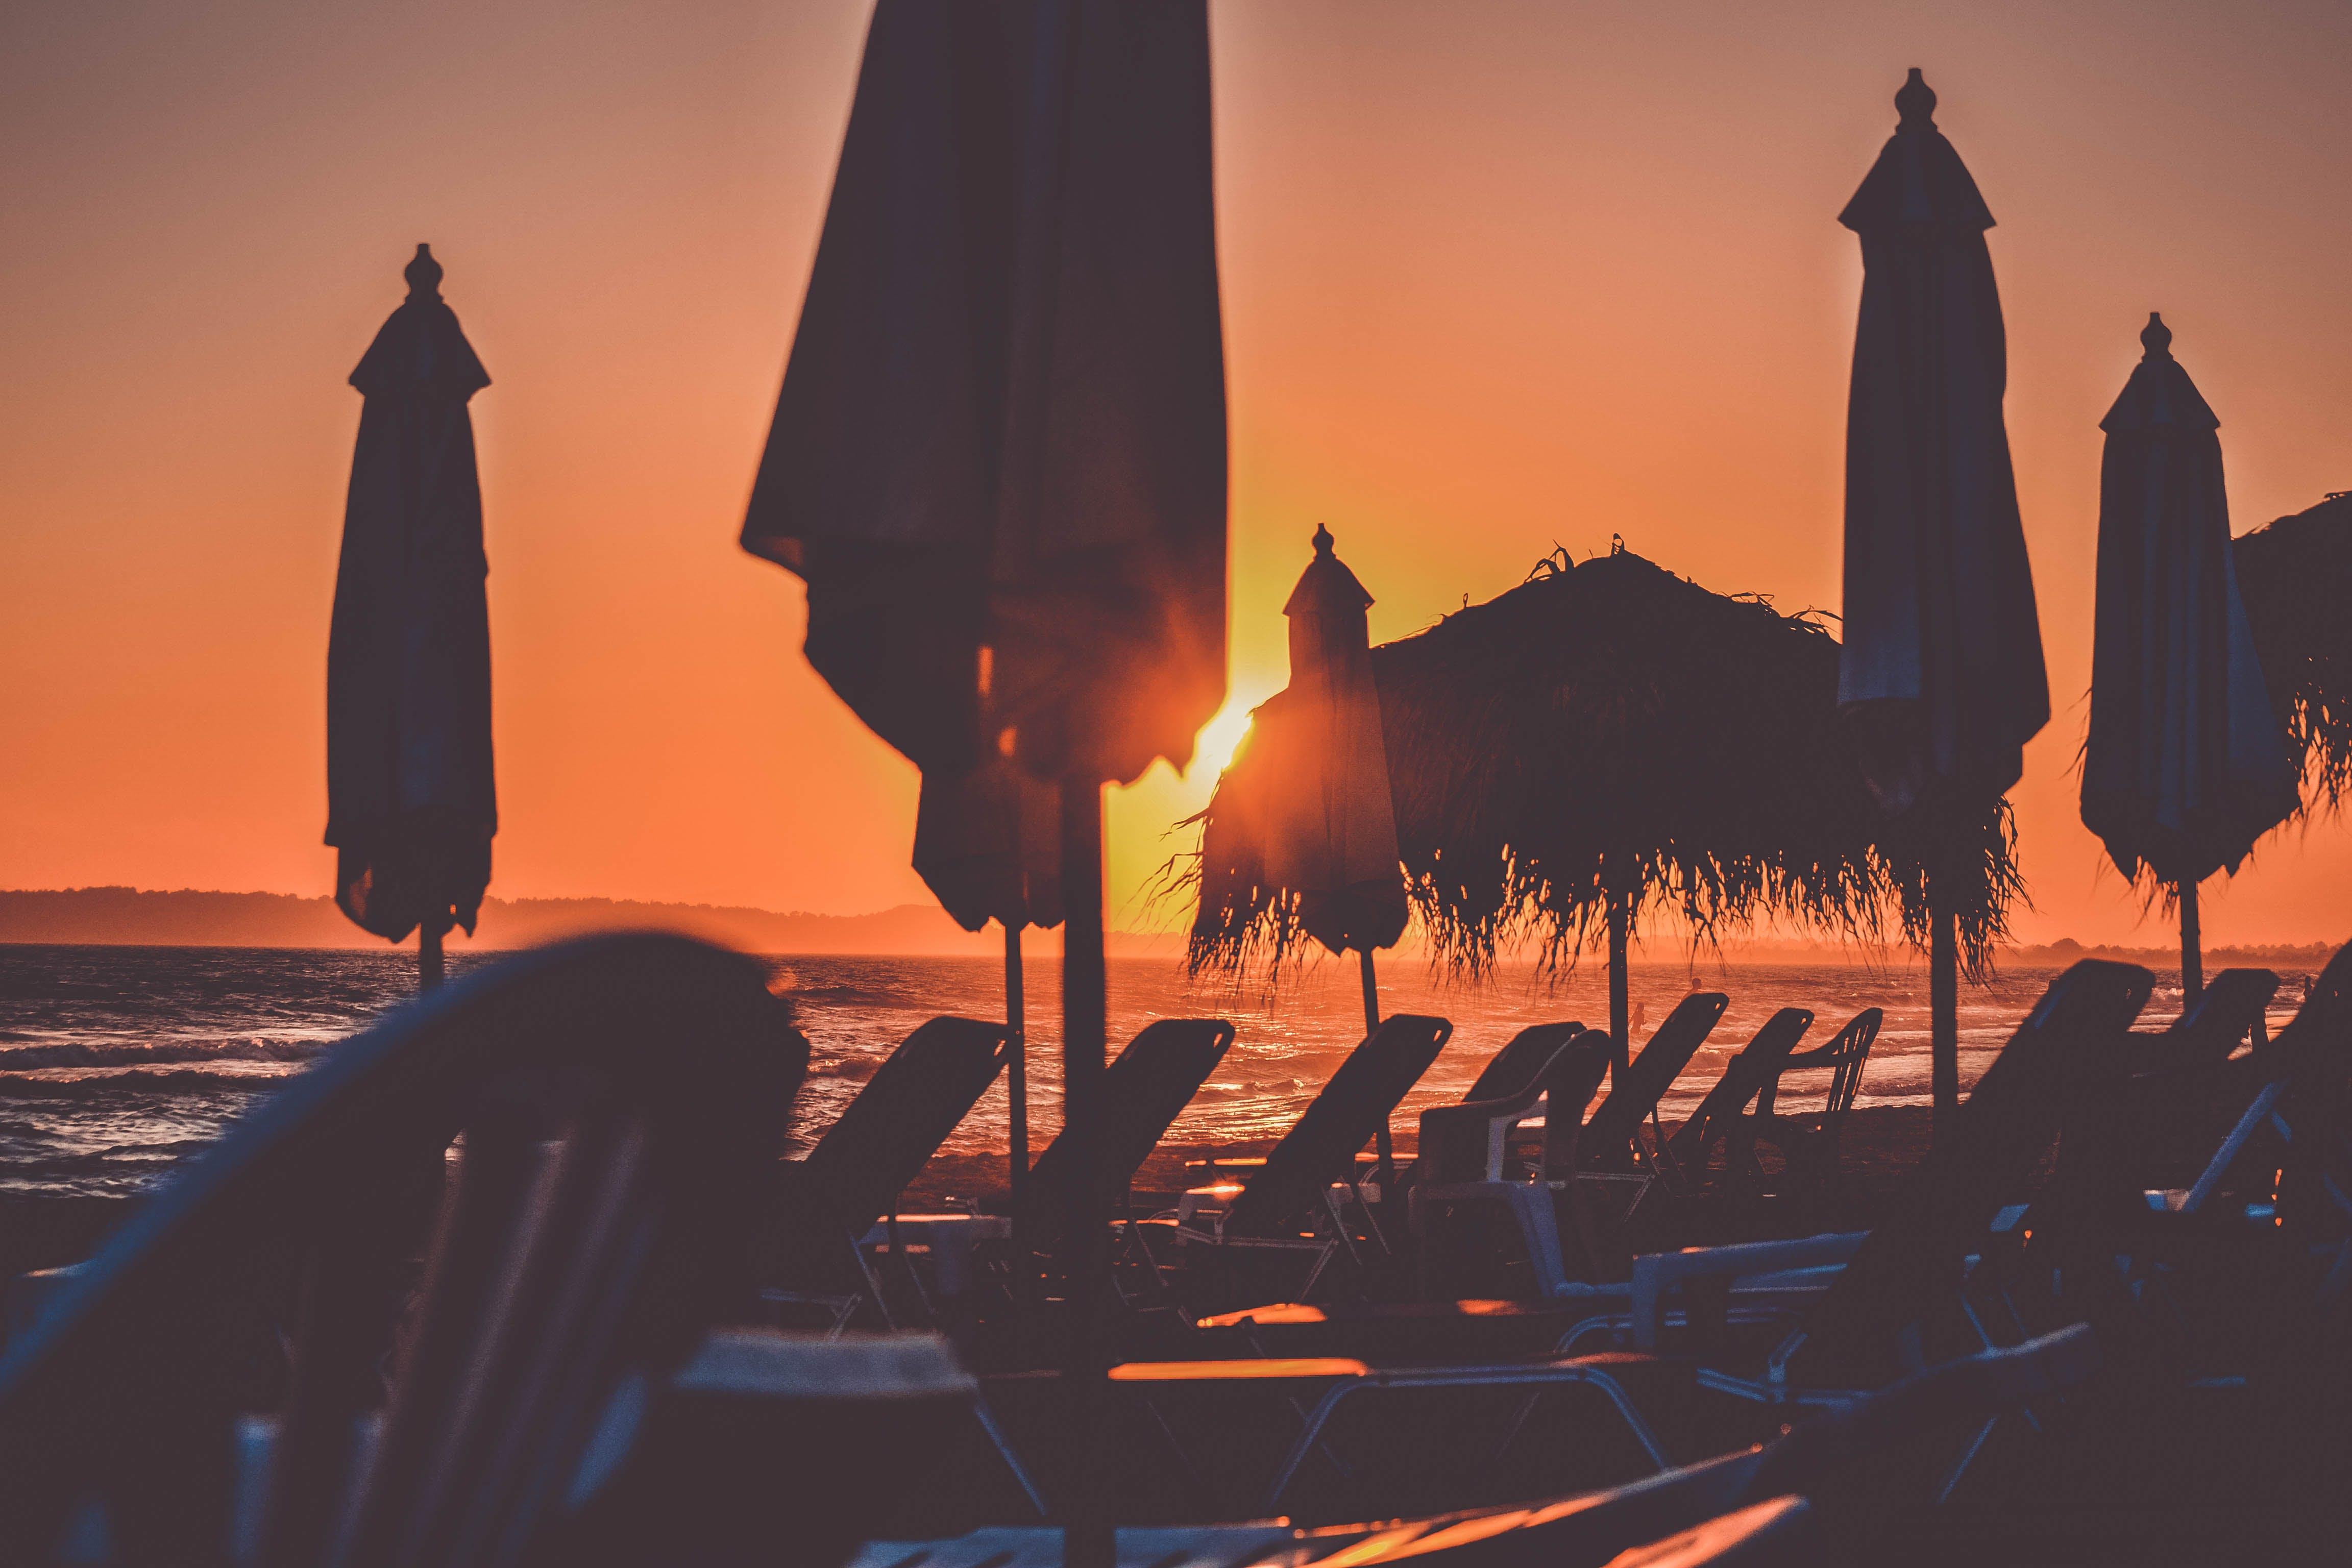 Silhouette Photo of Patios on Beach Shore